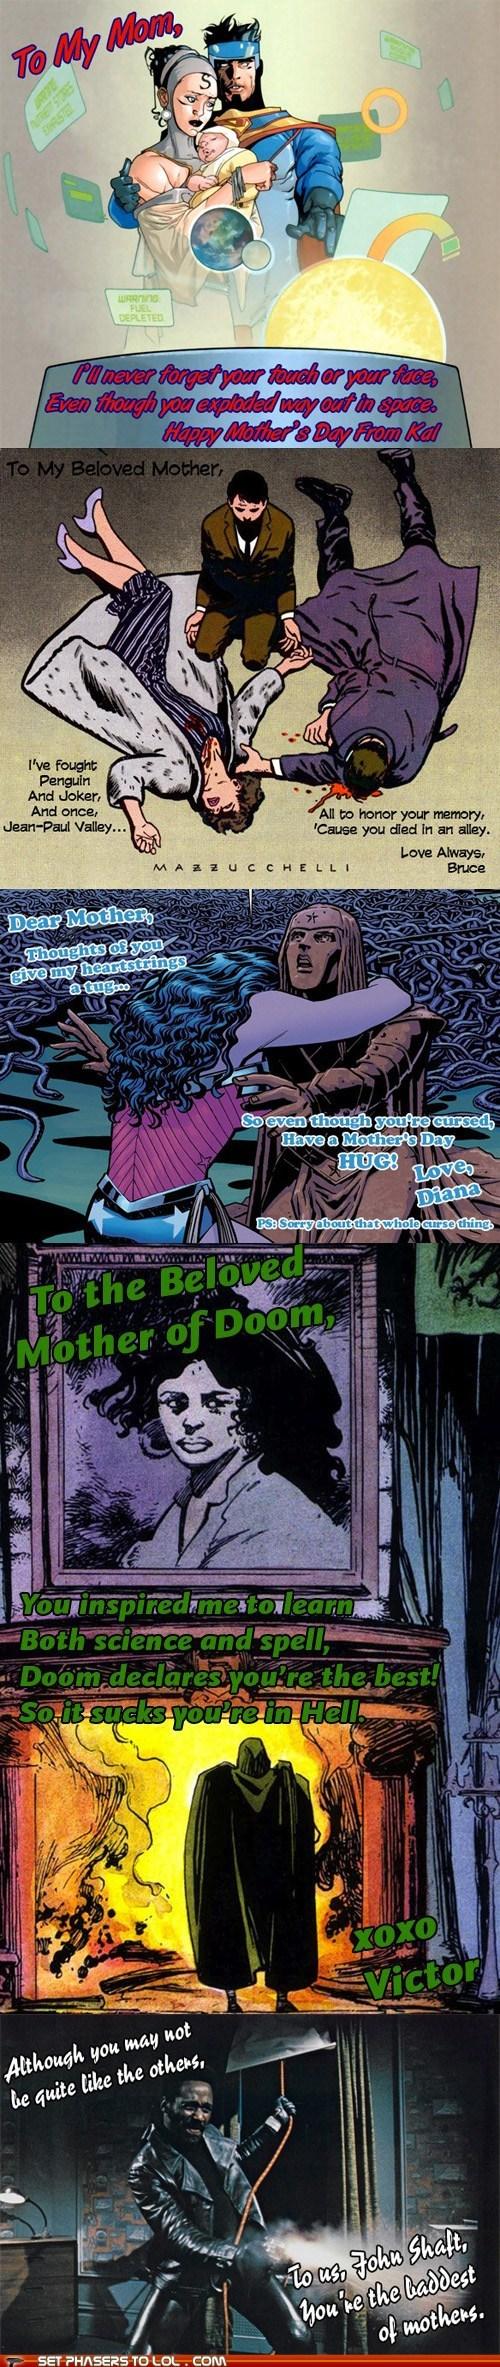 batman best of the week bruce wayne cards dr doom happy-mothers-day shaft superheroes superman wonder woman - 6218193664